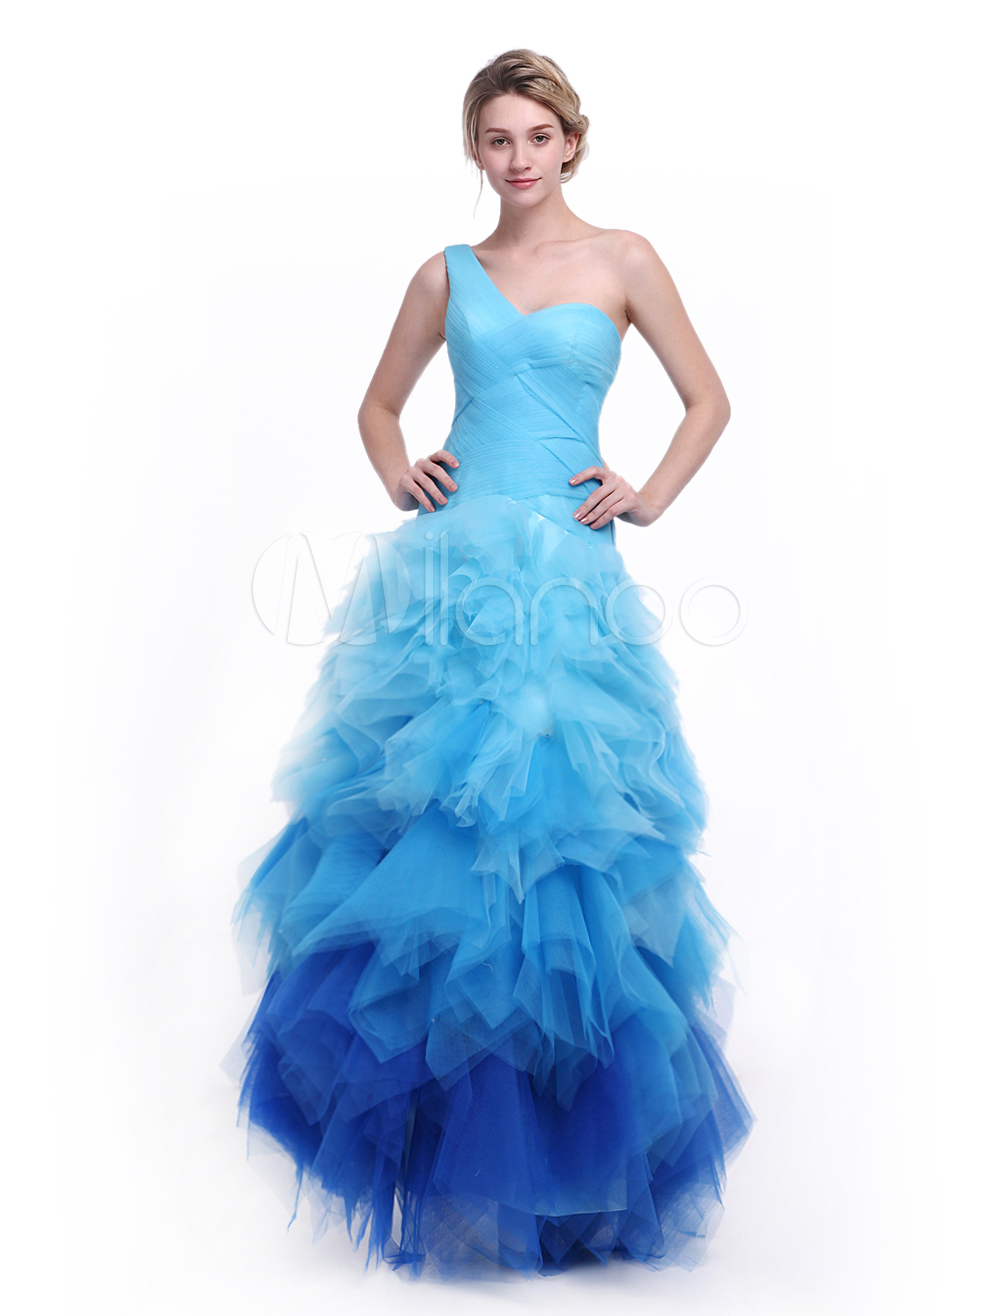 Blaue Prom-Kleid mit One-Shoulder und Farbverlauf Milanoo - Milanoo.com